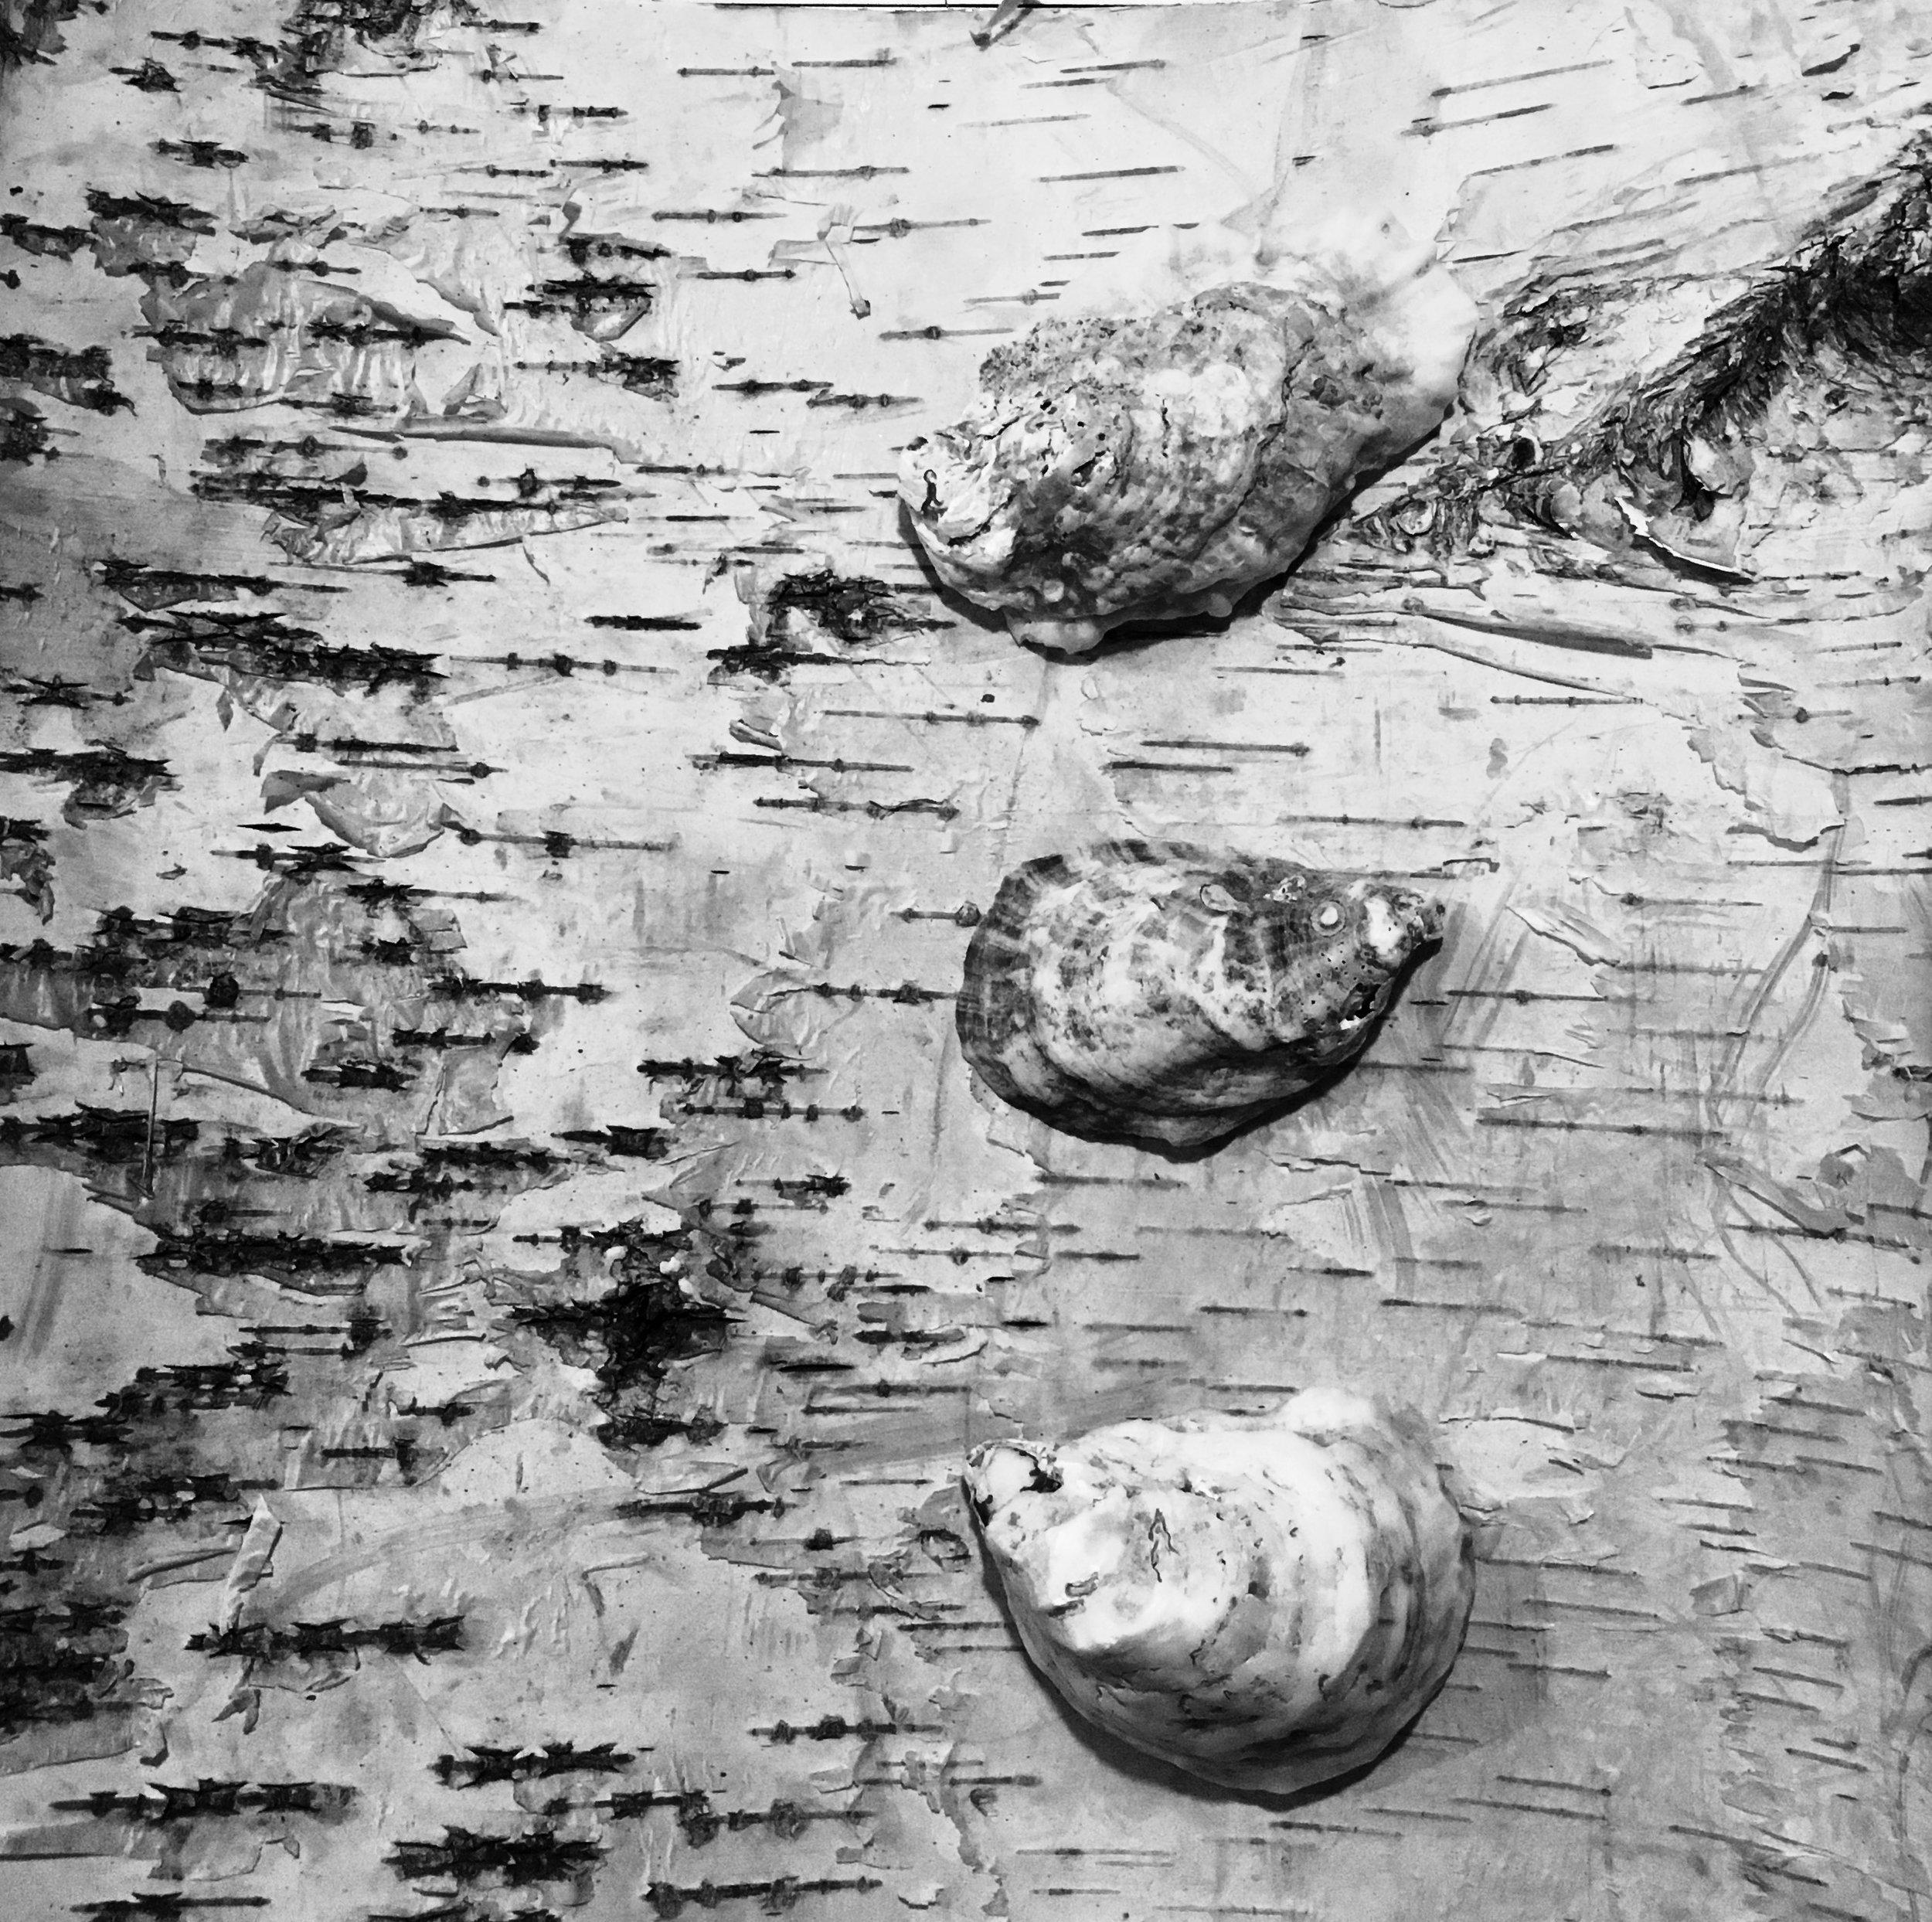 Oyster + Birch Topography in B&W